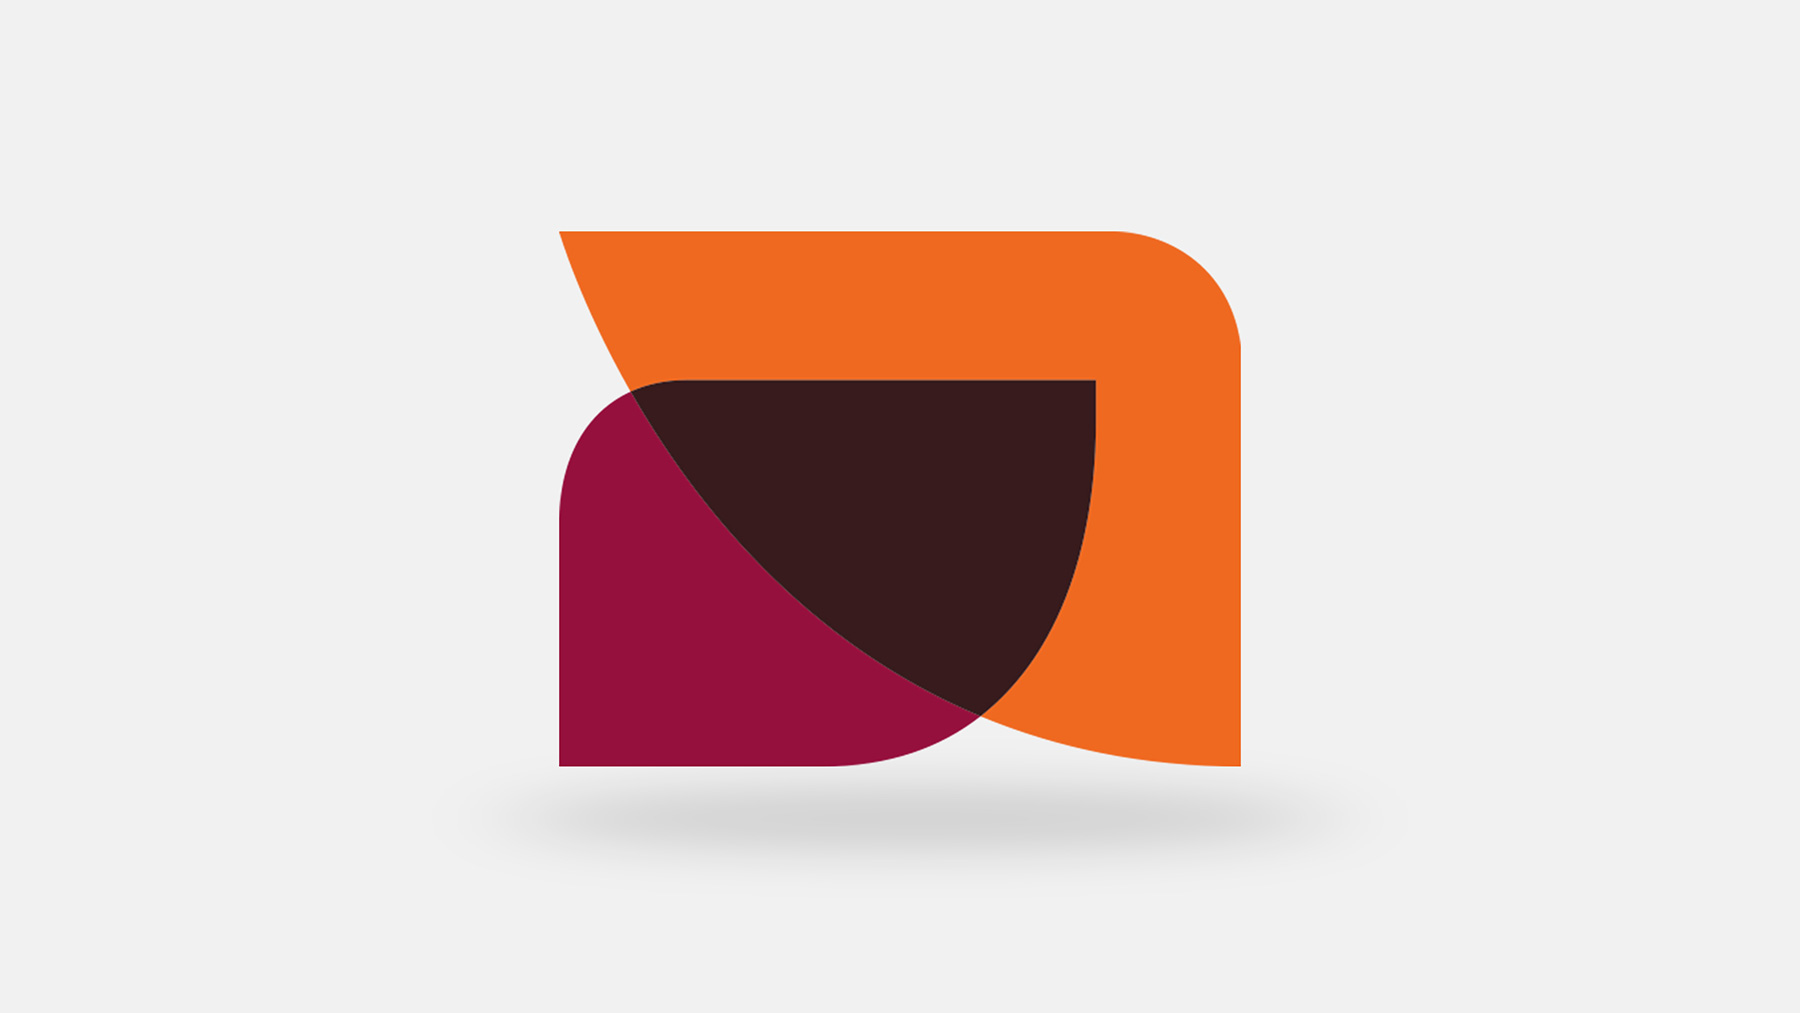 jajo-andoverstatebank-casestudy-1